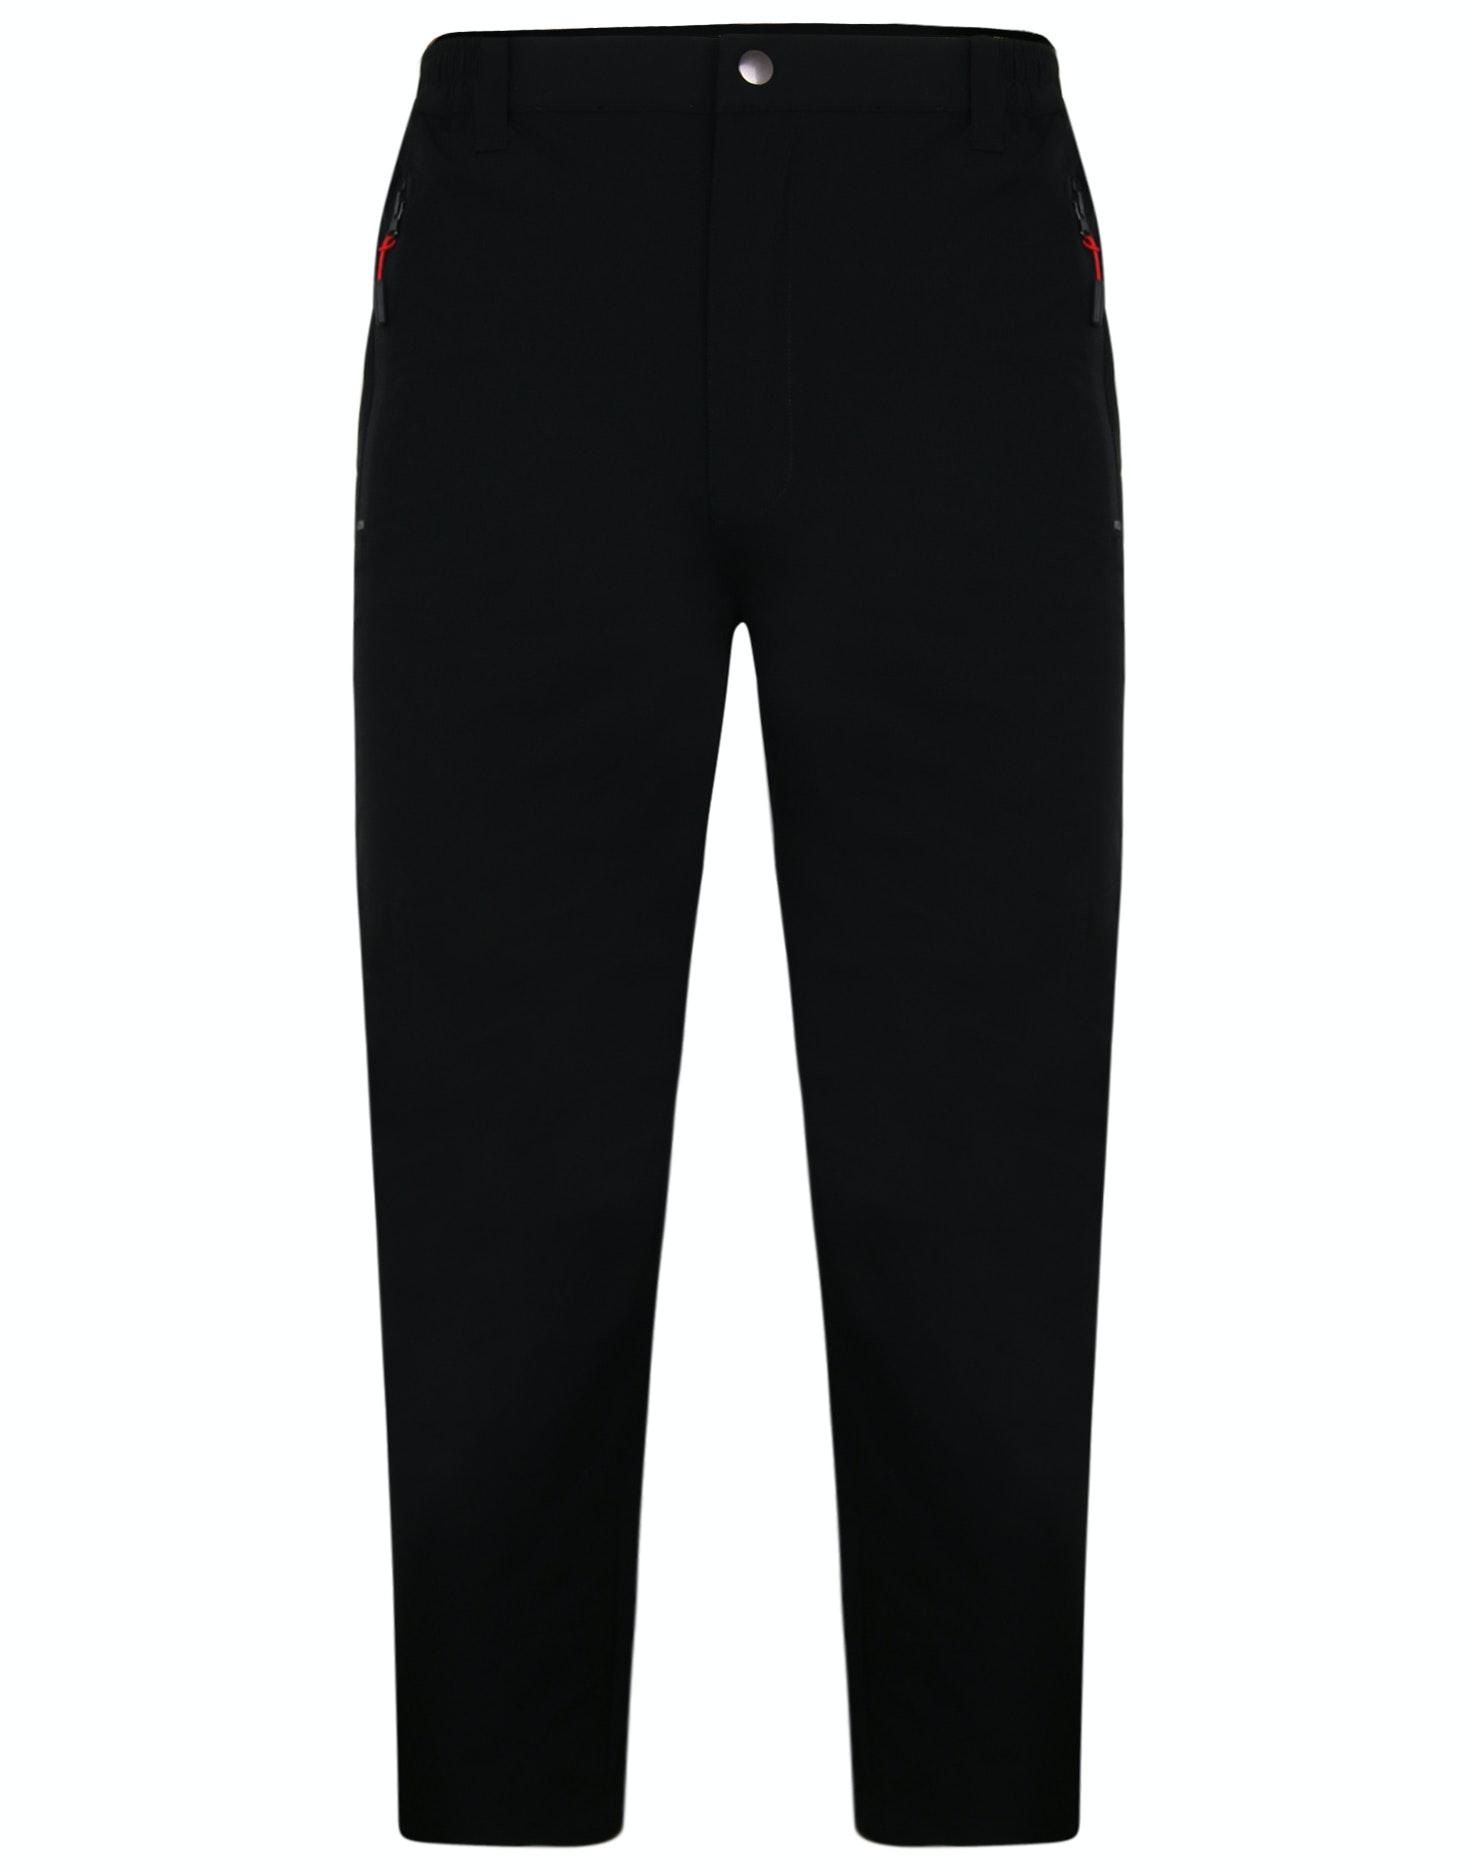 Men/'s Trousers Wide Cut Black 44-52 Selectable